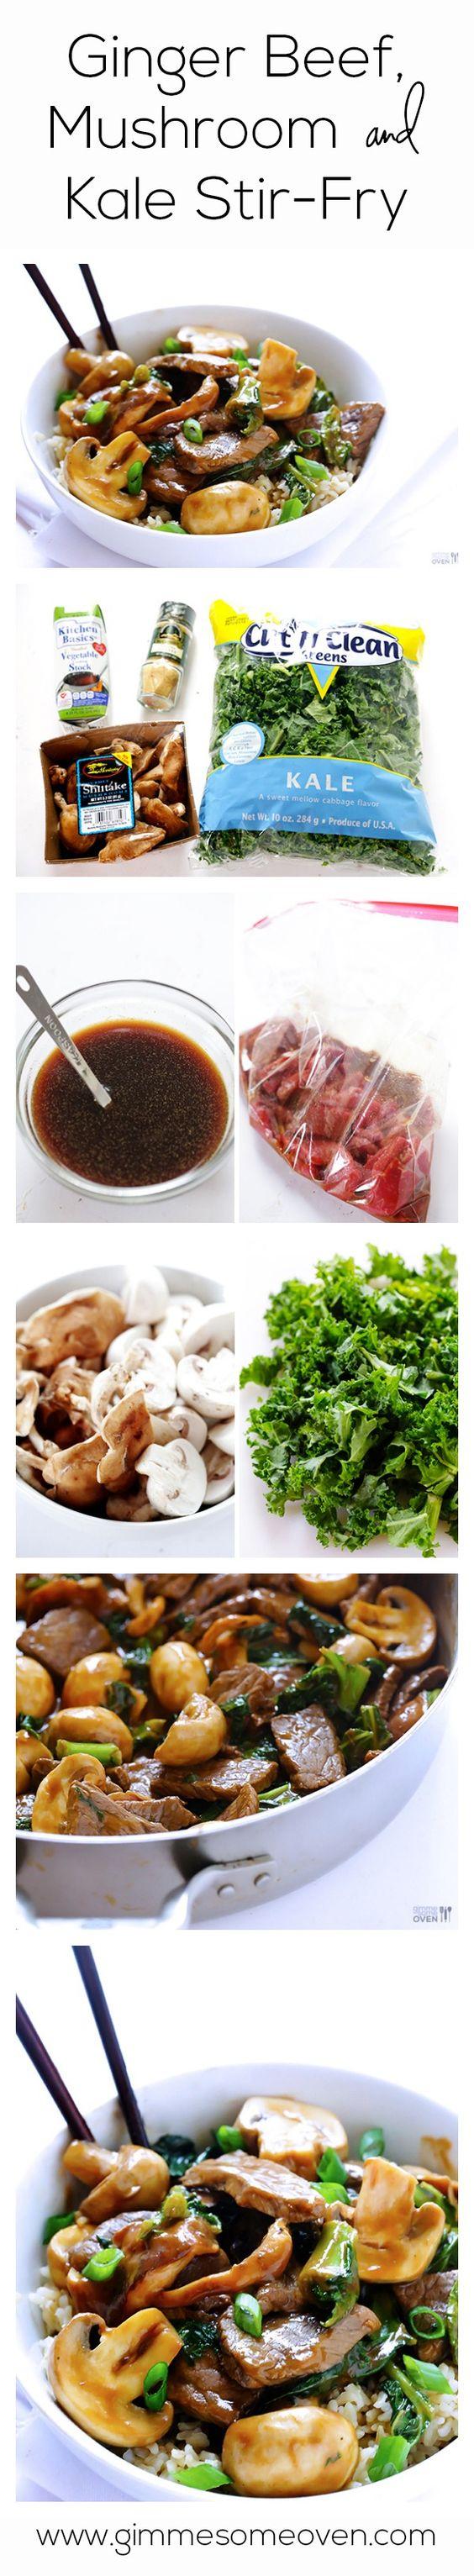 Ginger Beef, Mushroom & Kale Stir-Fry | Recipe | Easy Stir ...